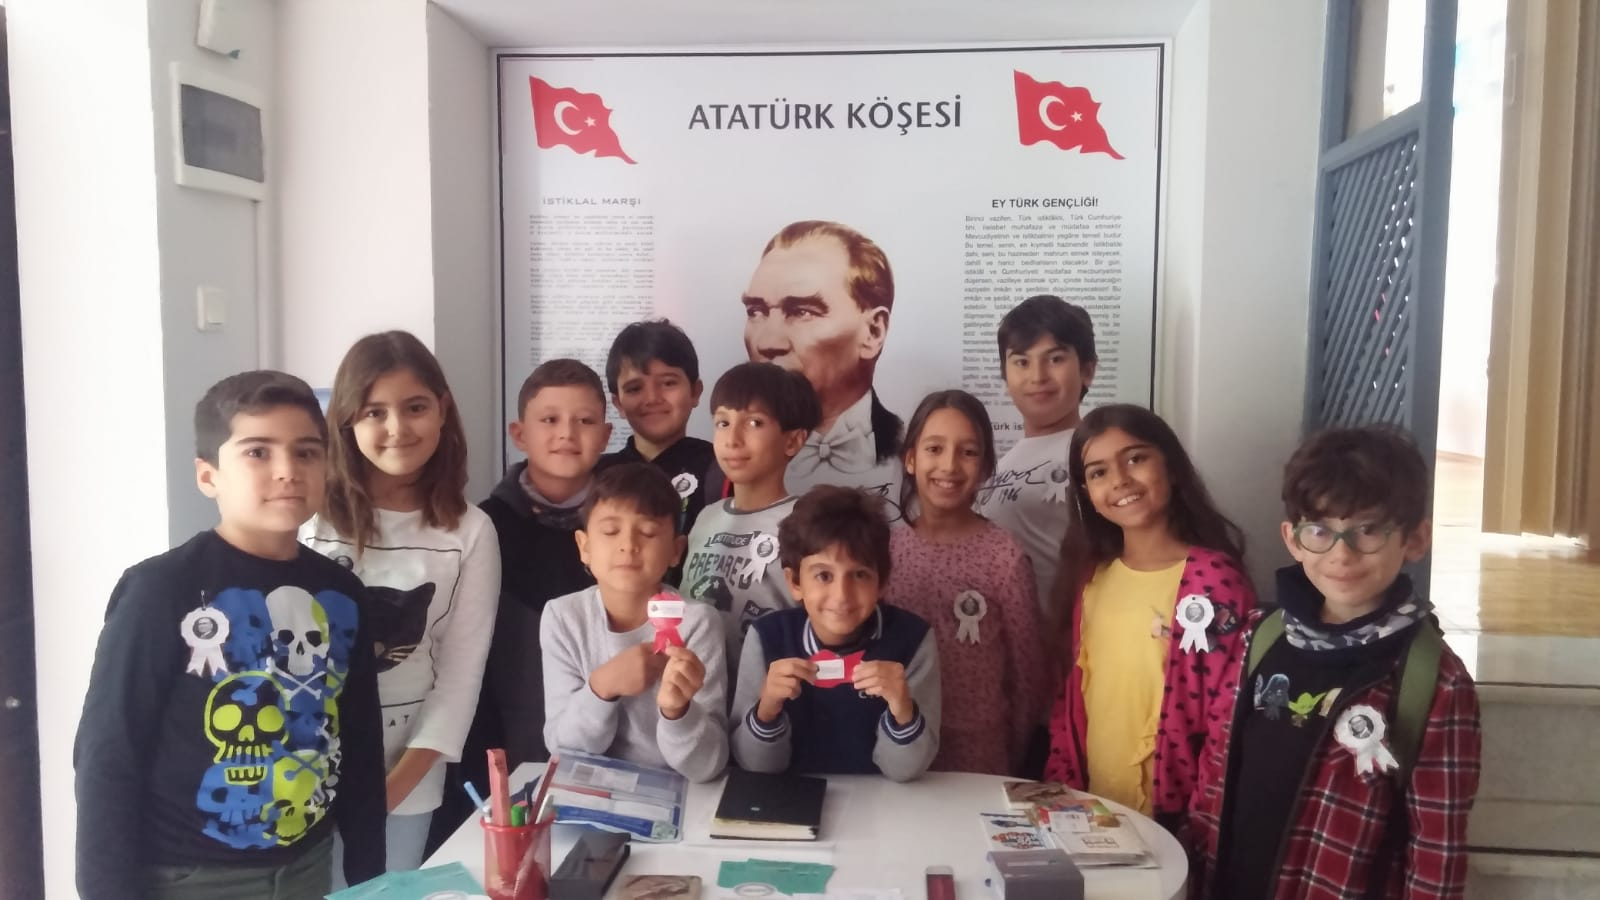 29 Ekim Cumhuriyet Bayrami Icin Ataturk Rozetlerimizi Child